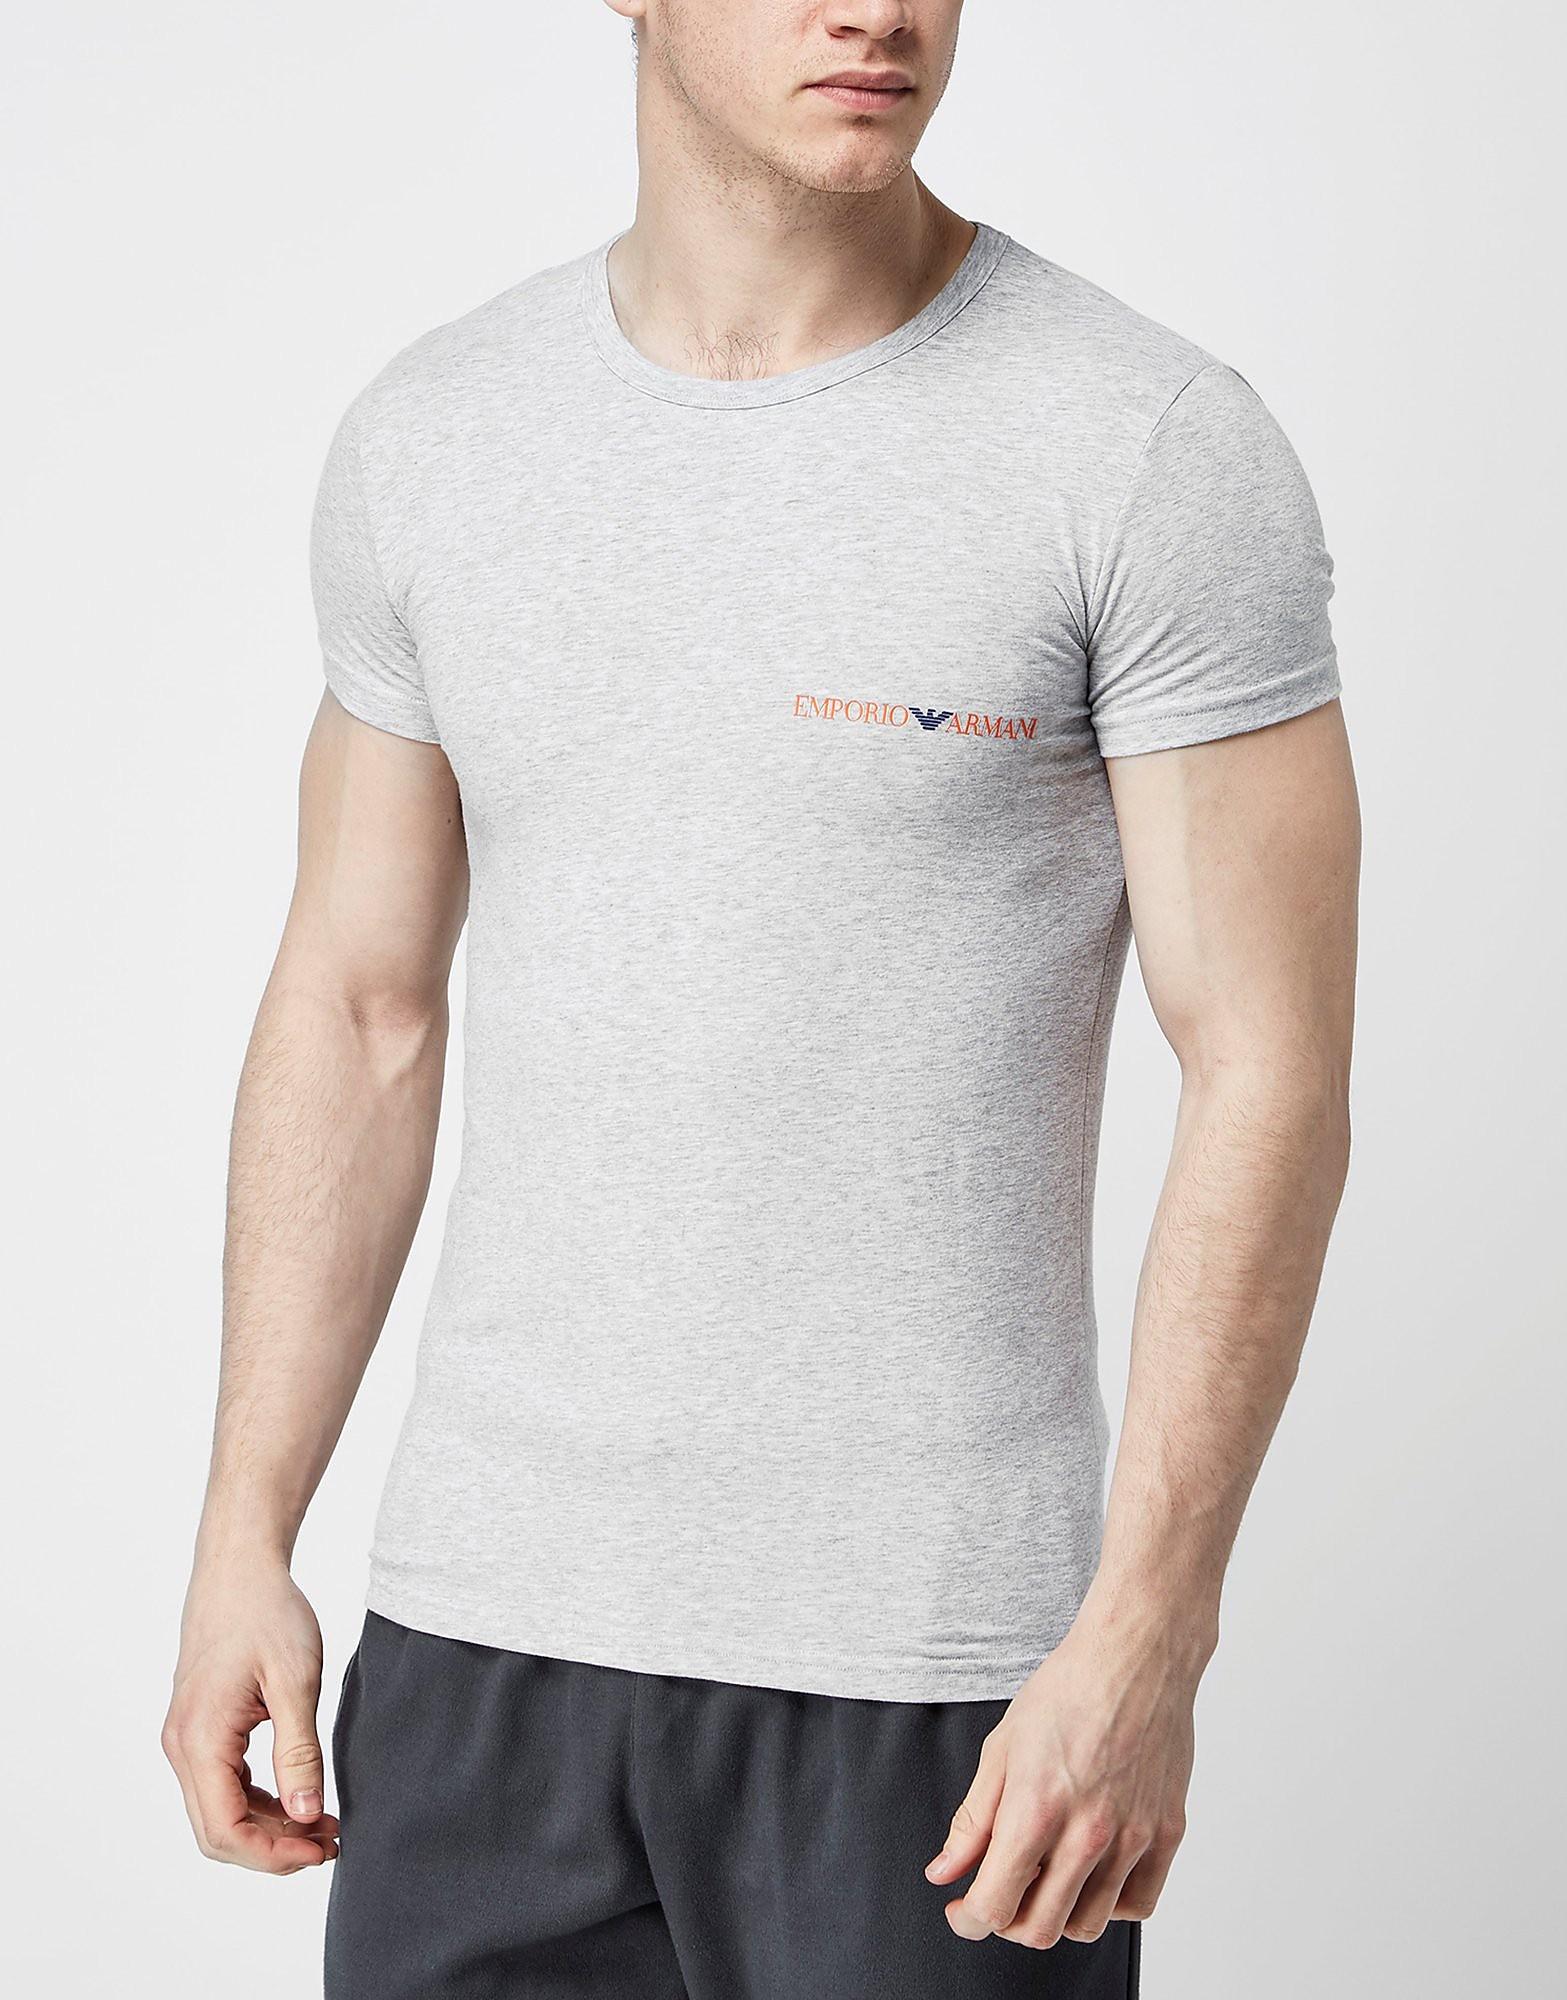 Emporio Armani Rainbow Crew Neck T-Shirt